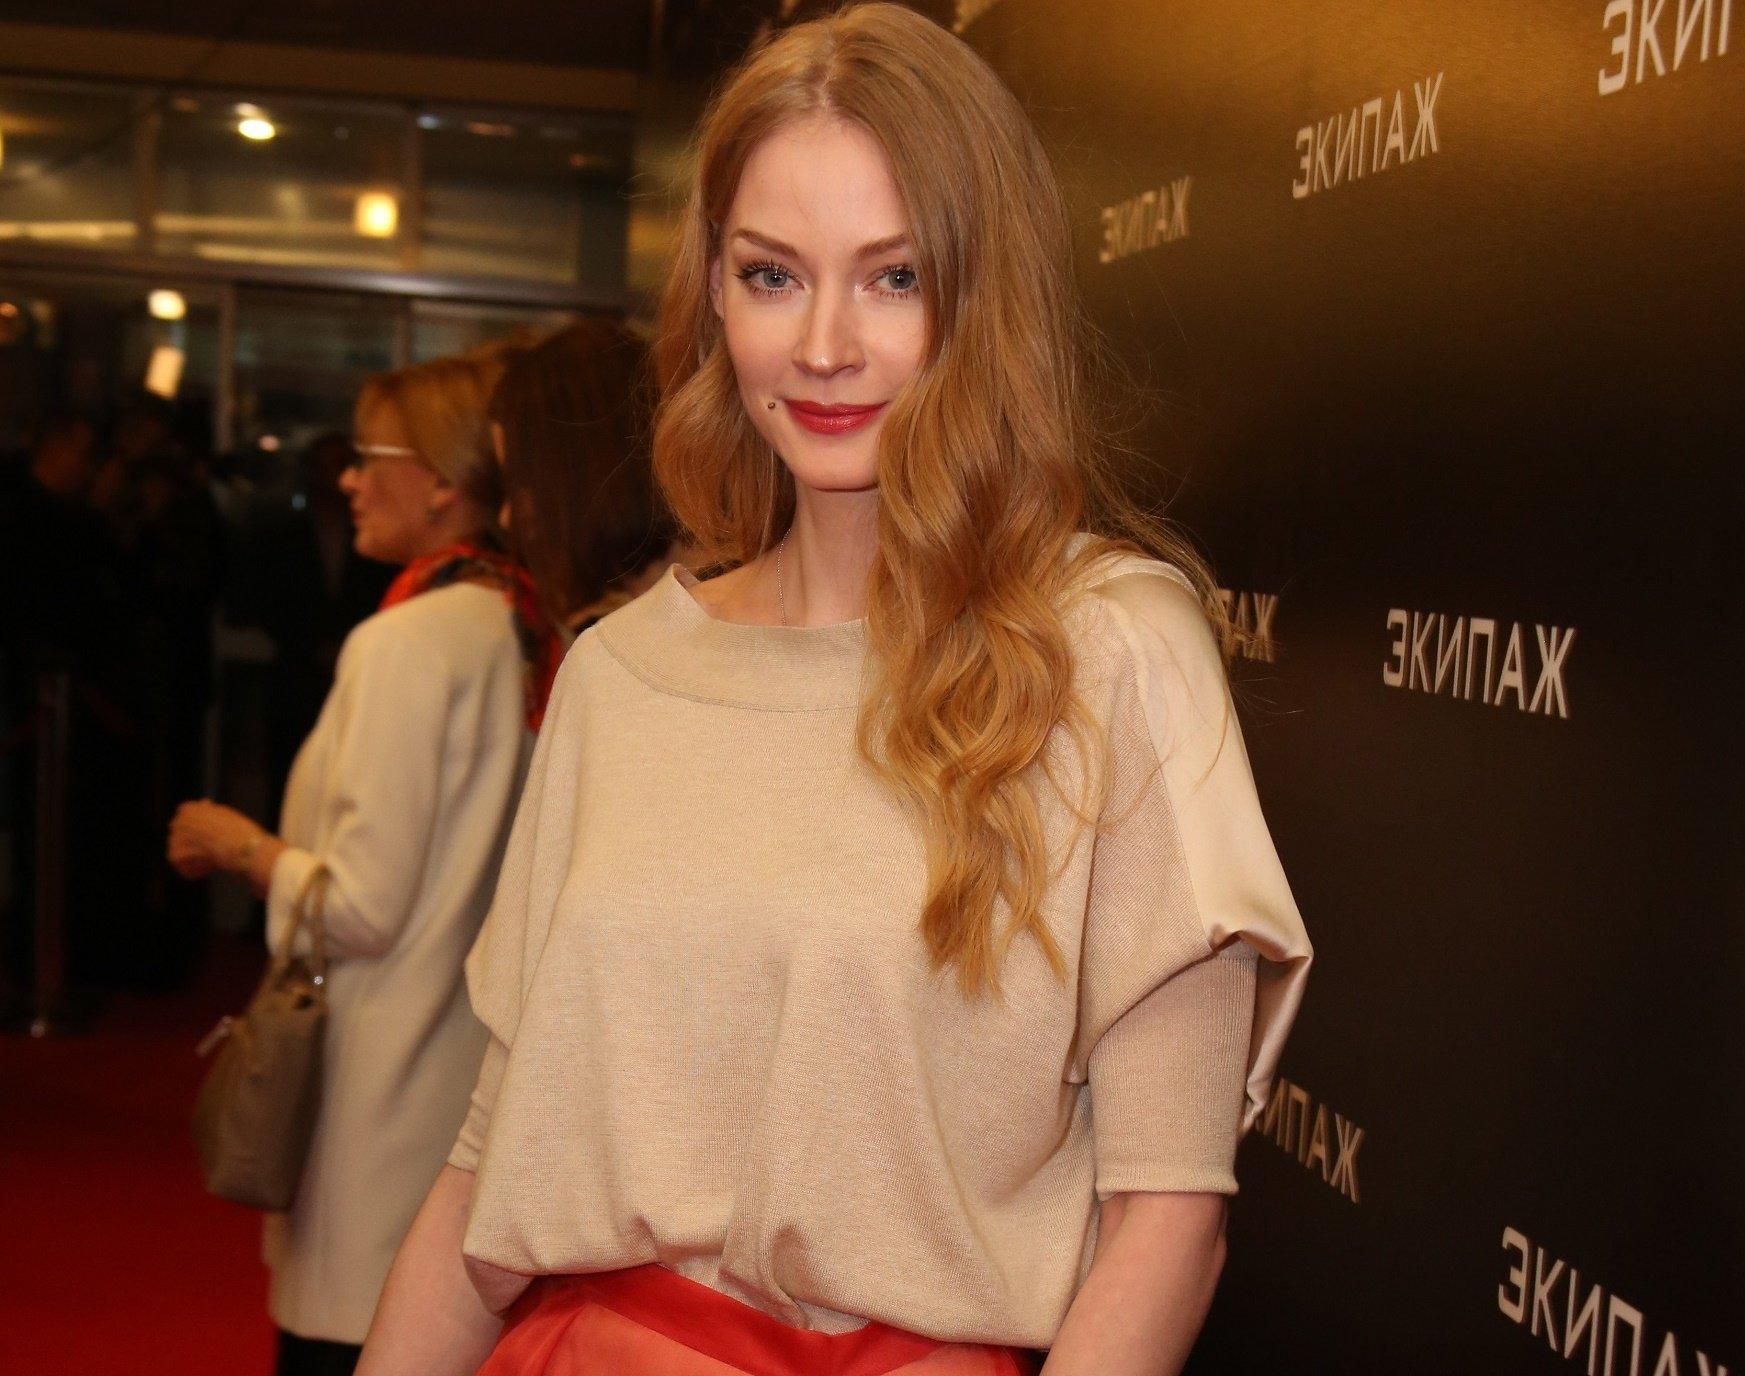 35-летняя Ходченкова выходит замуж&nbsp